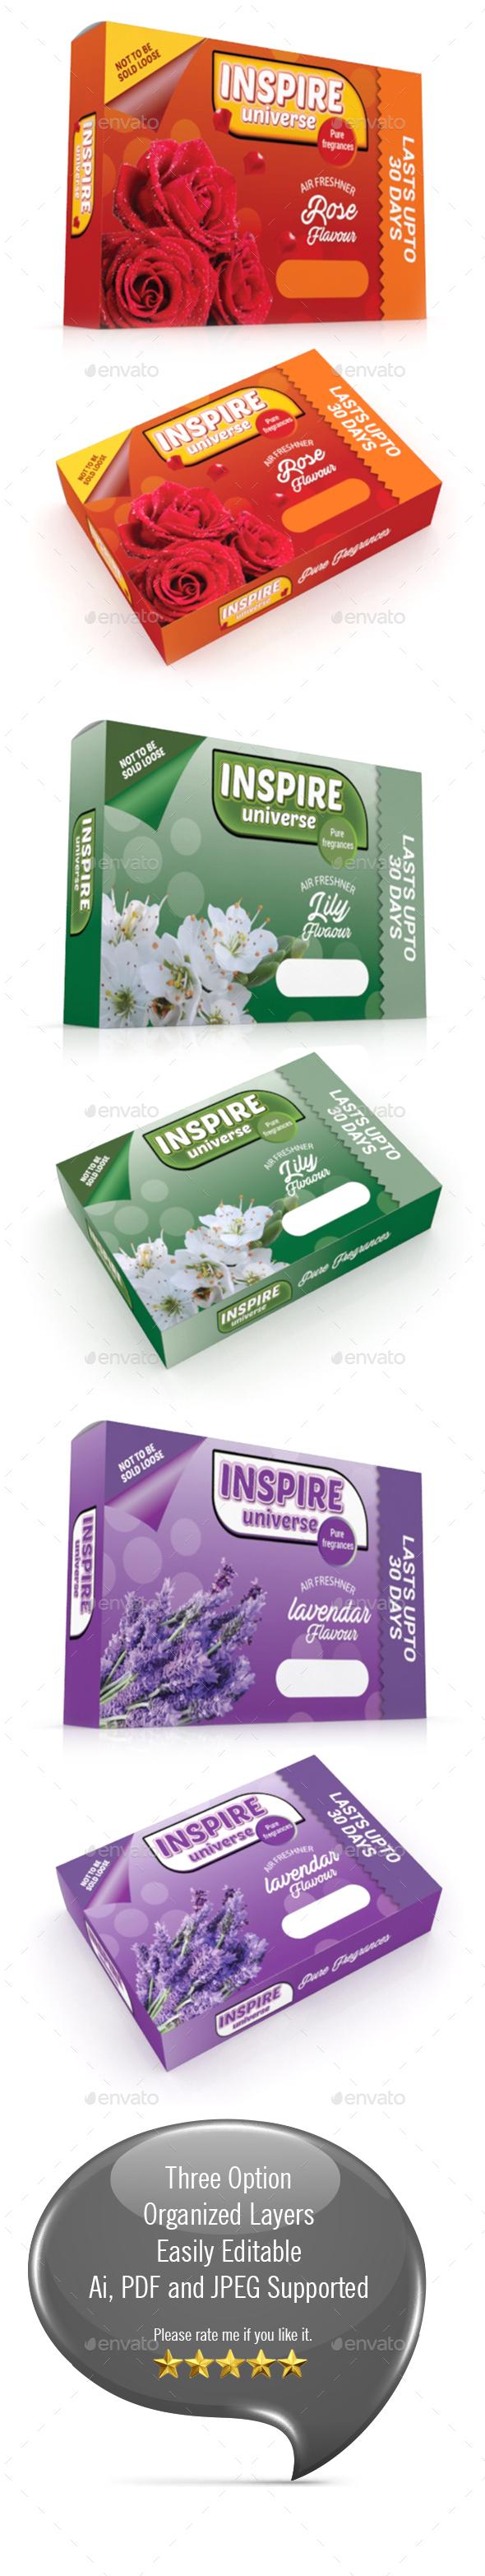 Air Freshener Packaging Template - Packaging Print Templates